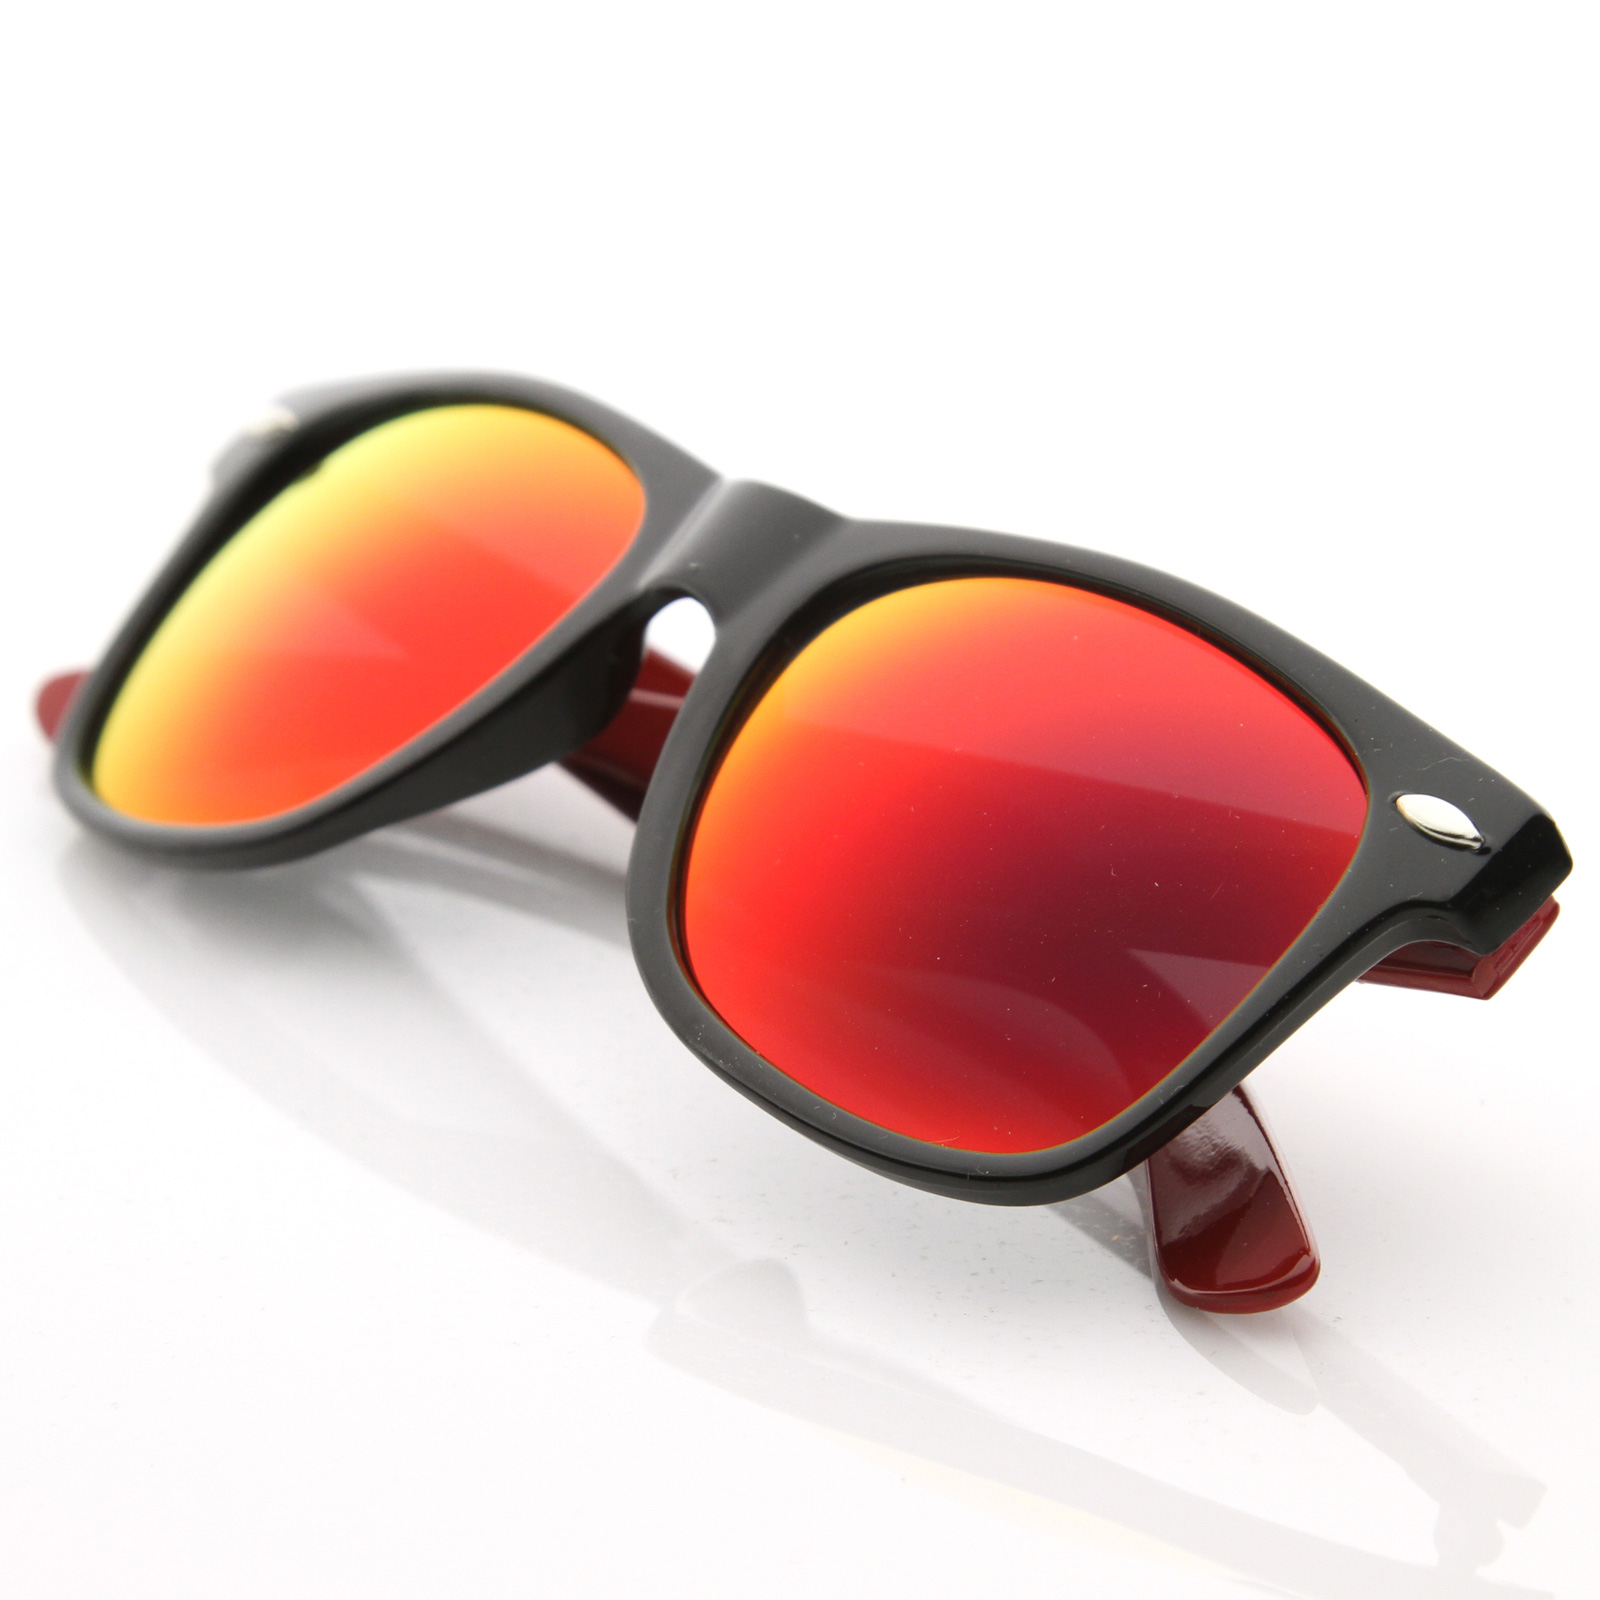 Retro-Intense-Action-Full-Revo-Mirror-Lens-Two-Tone-Color-Shades-Sunglasses-8559